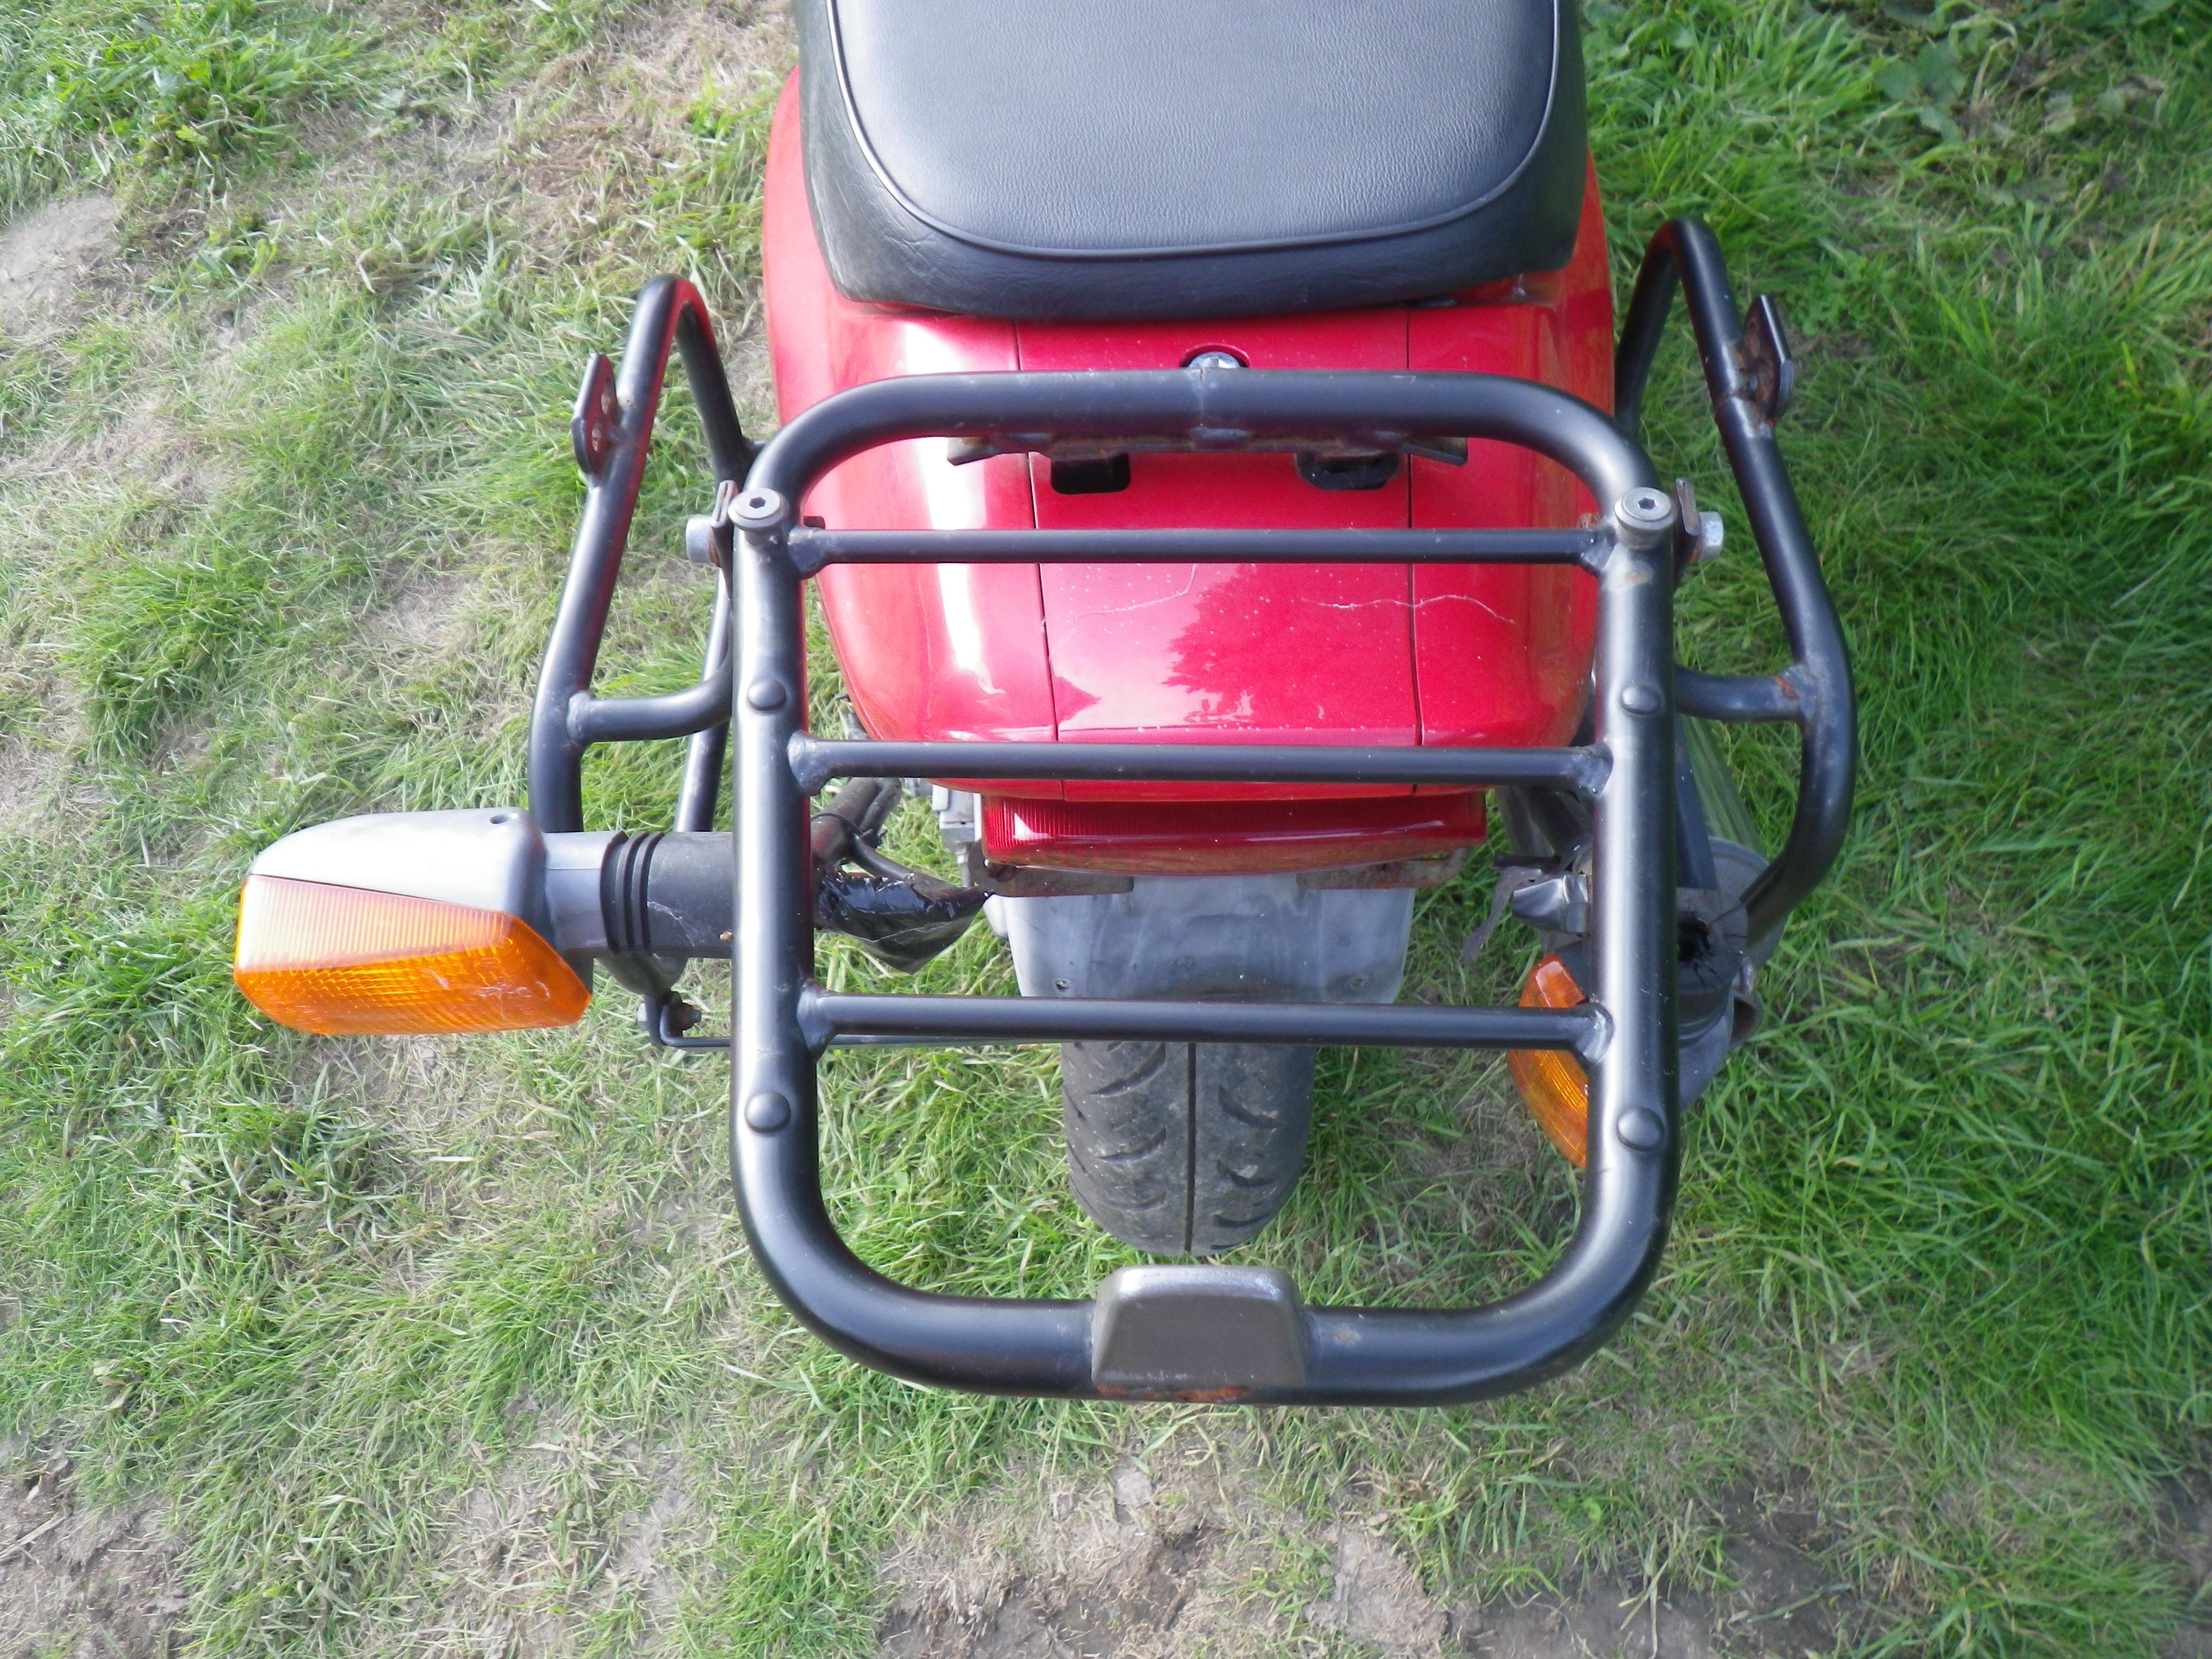 Kawasaki ER-5 ER500A Twister | motorradteile-bielefeld.de